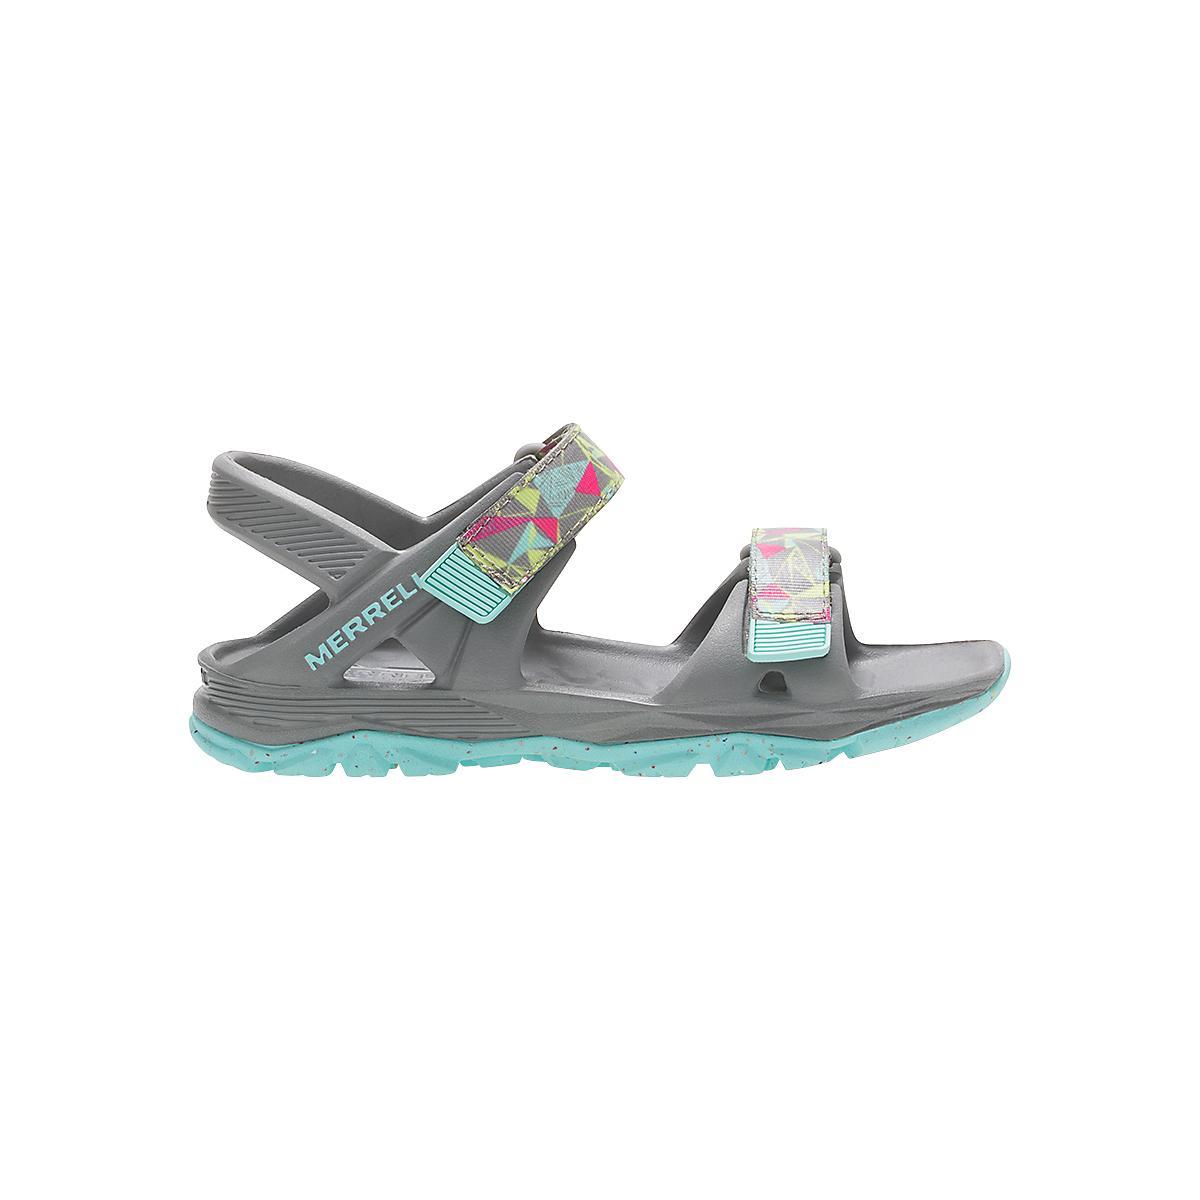 1c1673ee4726 Merrell Hydro Drift Sandals Shoe